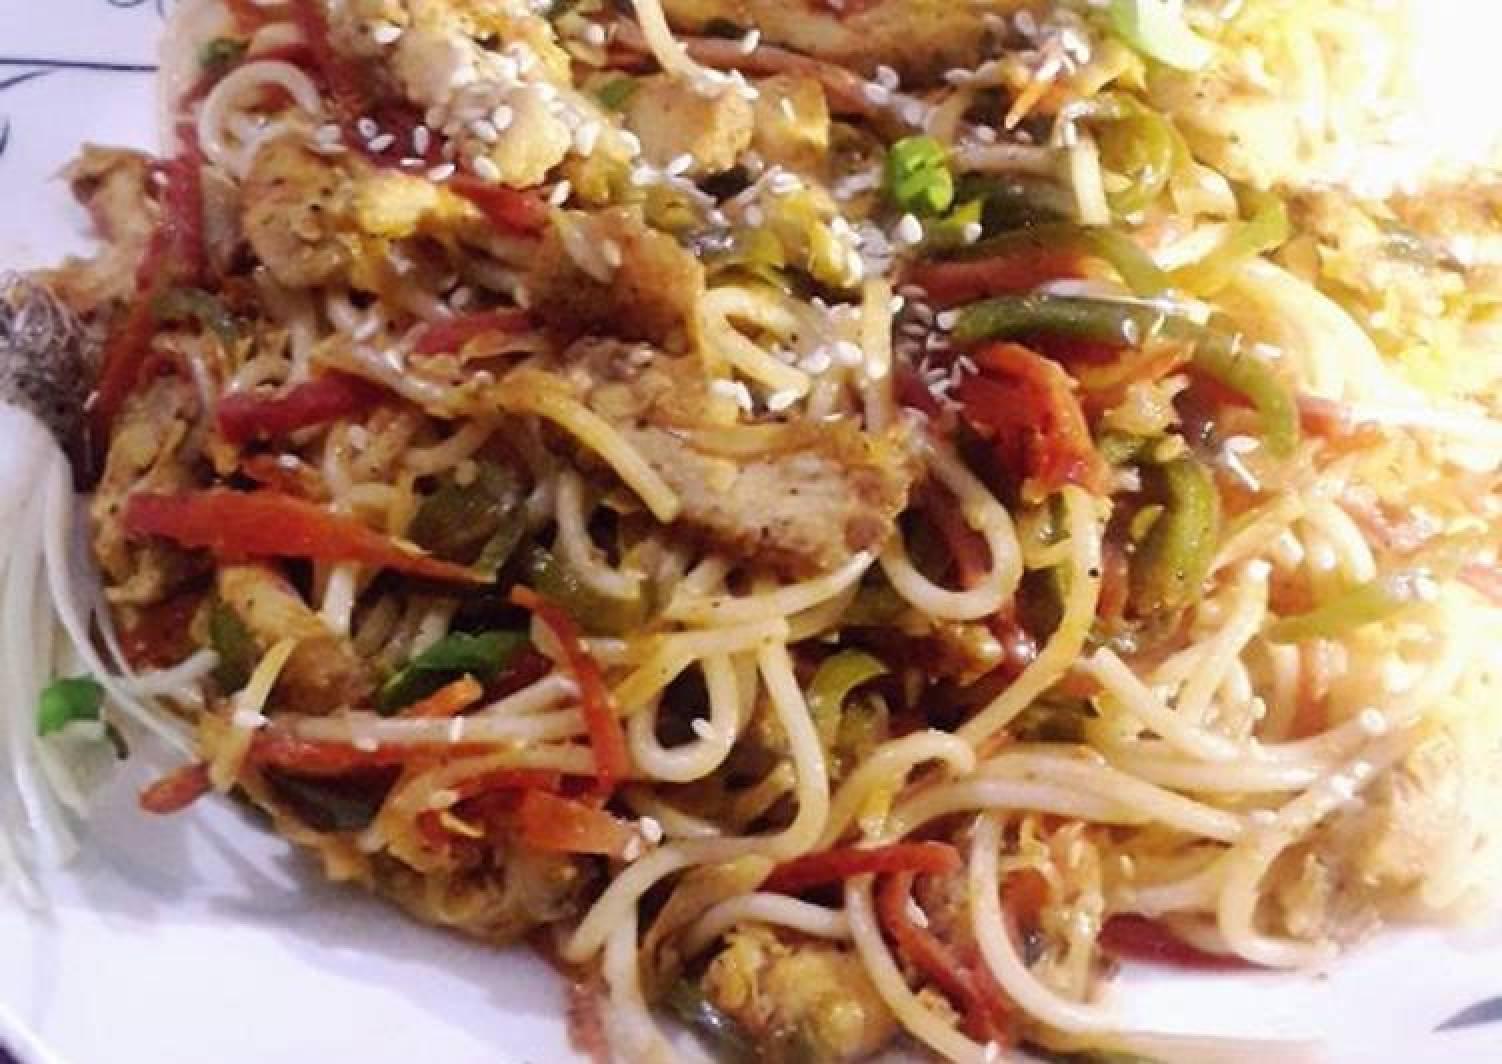 Chicken manchurian spaghetti